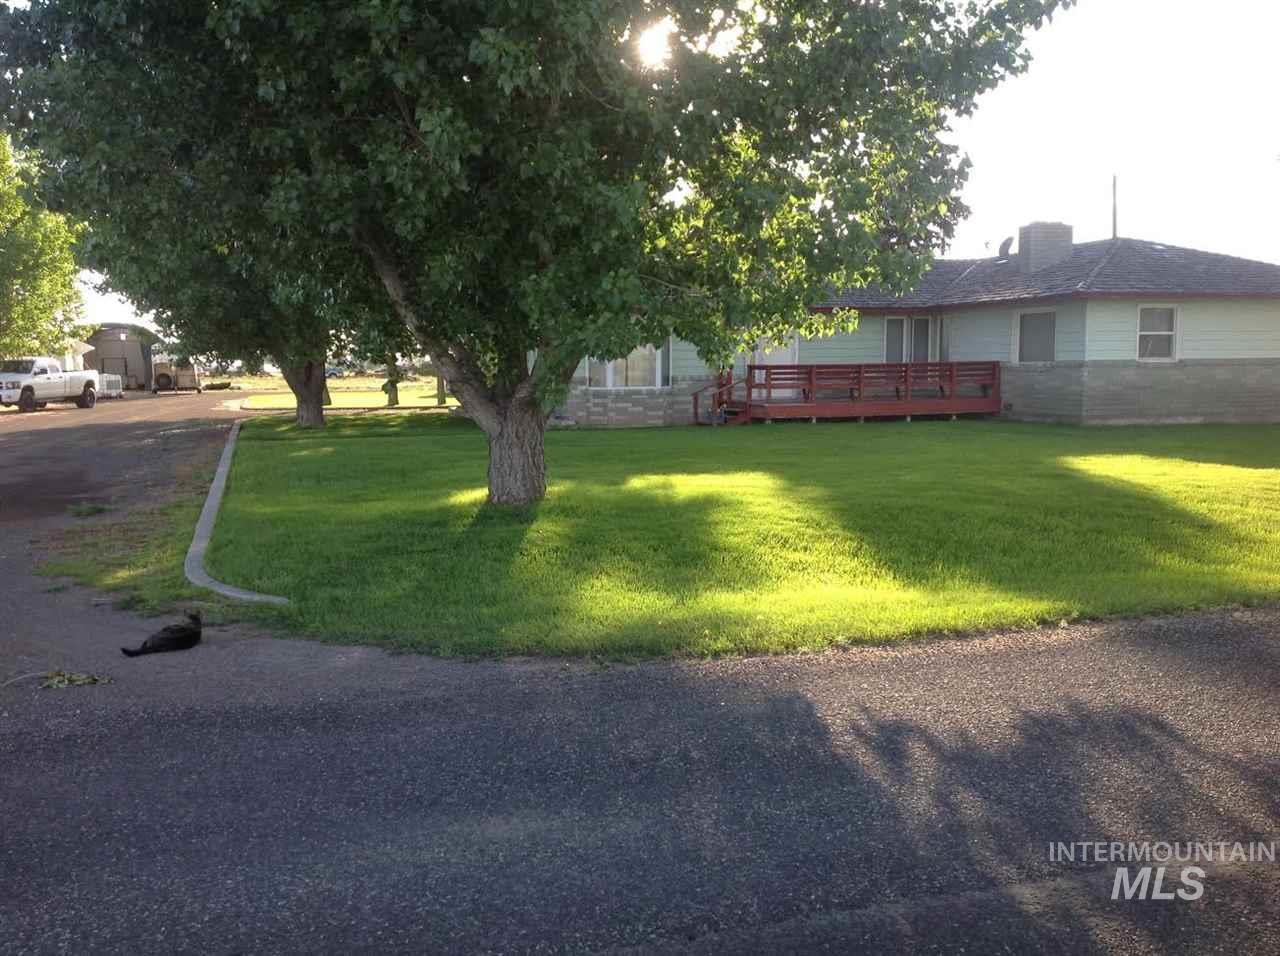 Single Family Home for Sale at 1997 E 1550 South Gooding, Idaho 83330